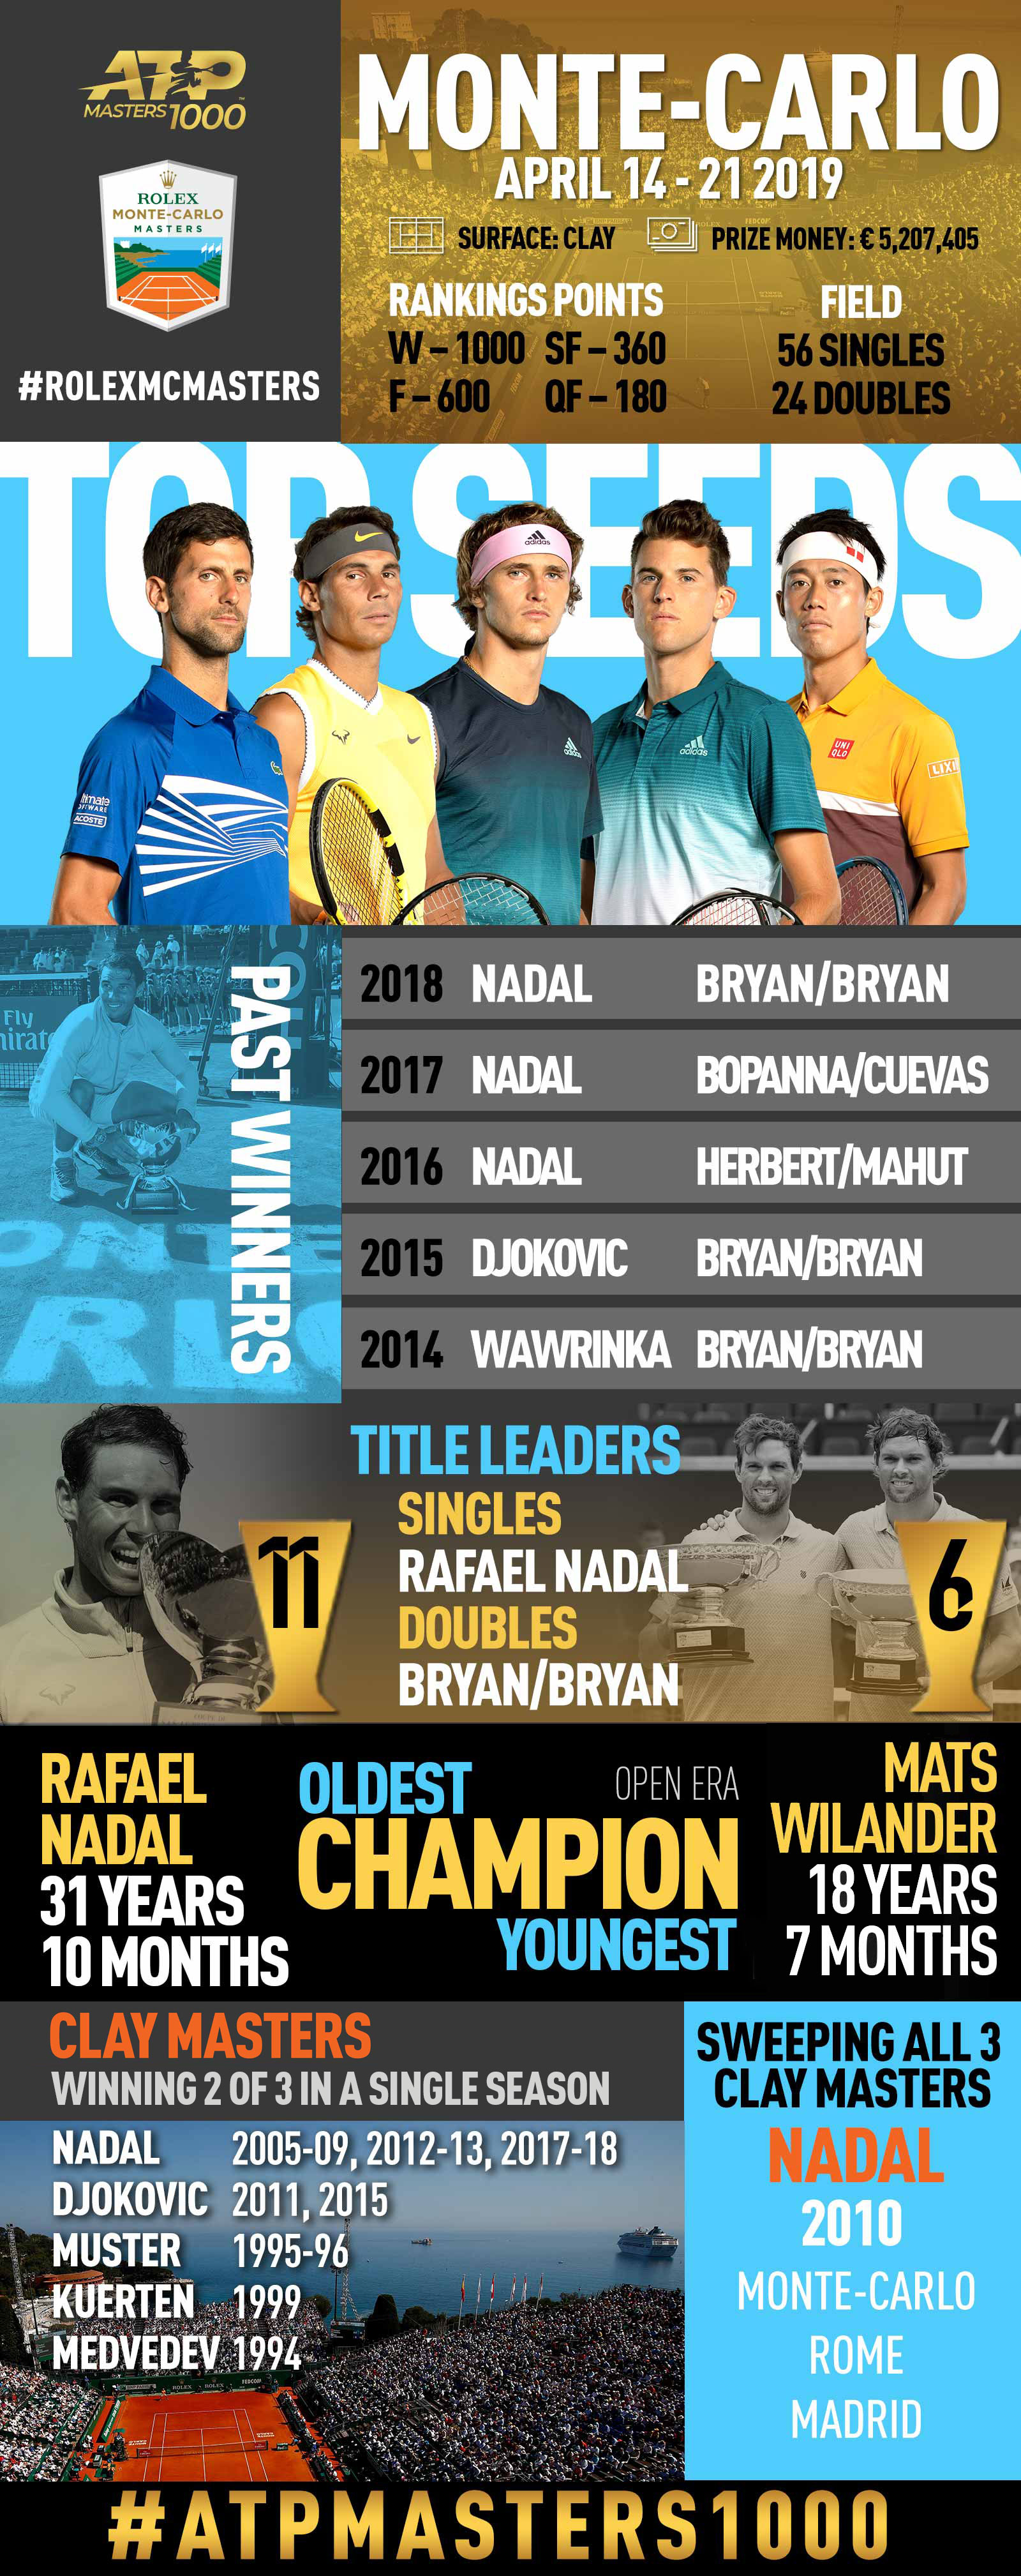 <a href='https://www.atptour.com/en/tournaments/monte-carlo/410/overview'>Rolex Monte-Carlo Masters</a>, an ATP Masters 1000 tennis tournament